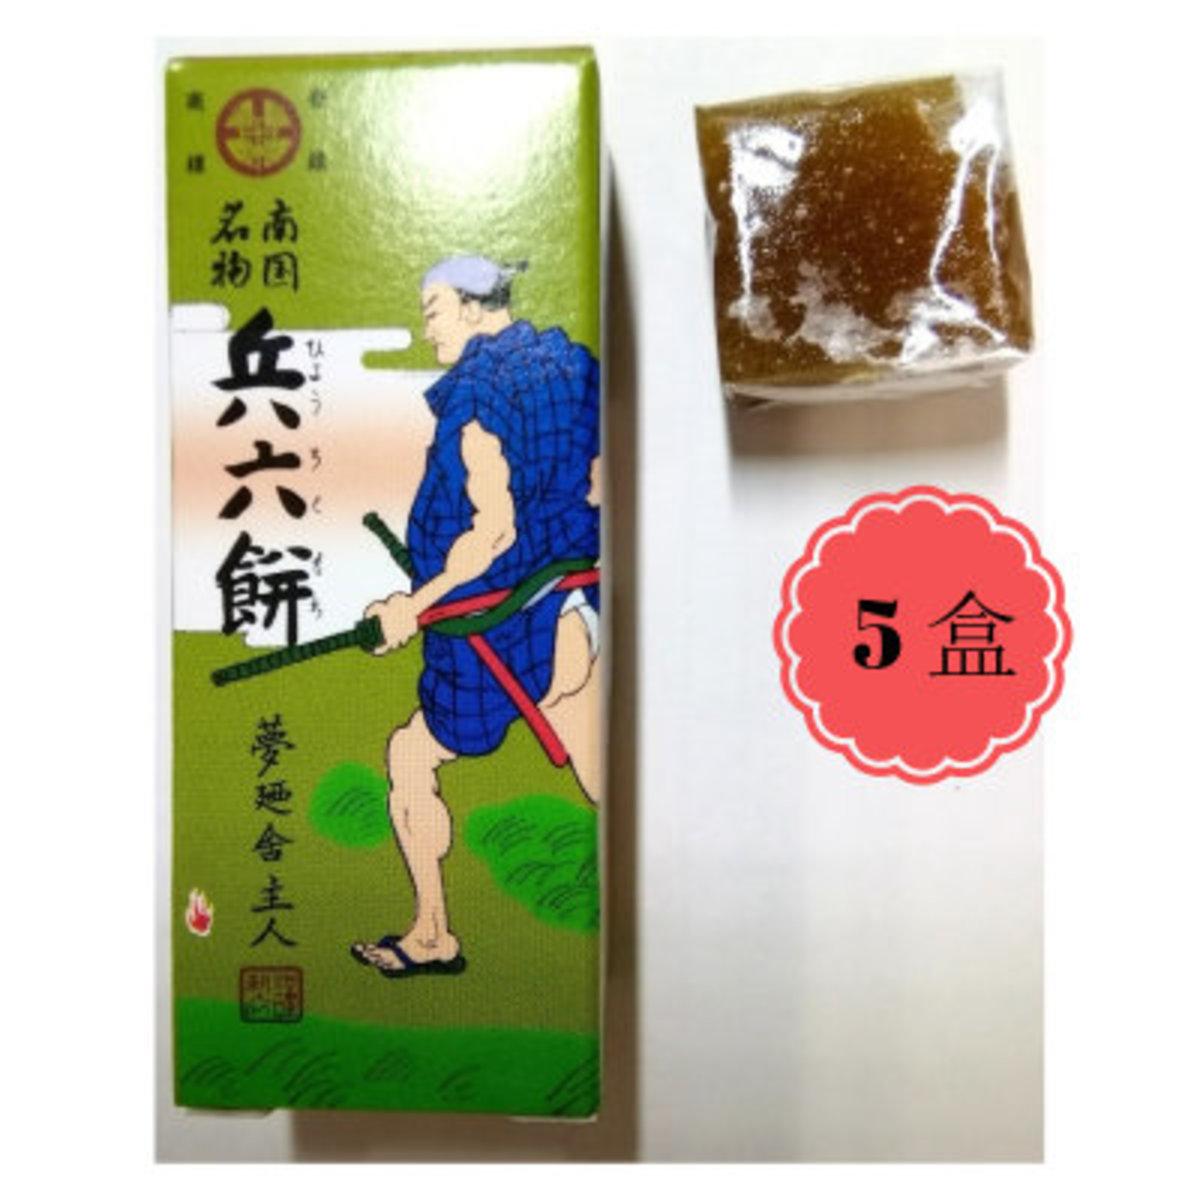 Hiroku Mochi Candy 4 tablets x 5pcs (45173882)